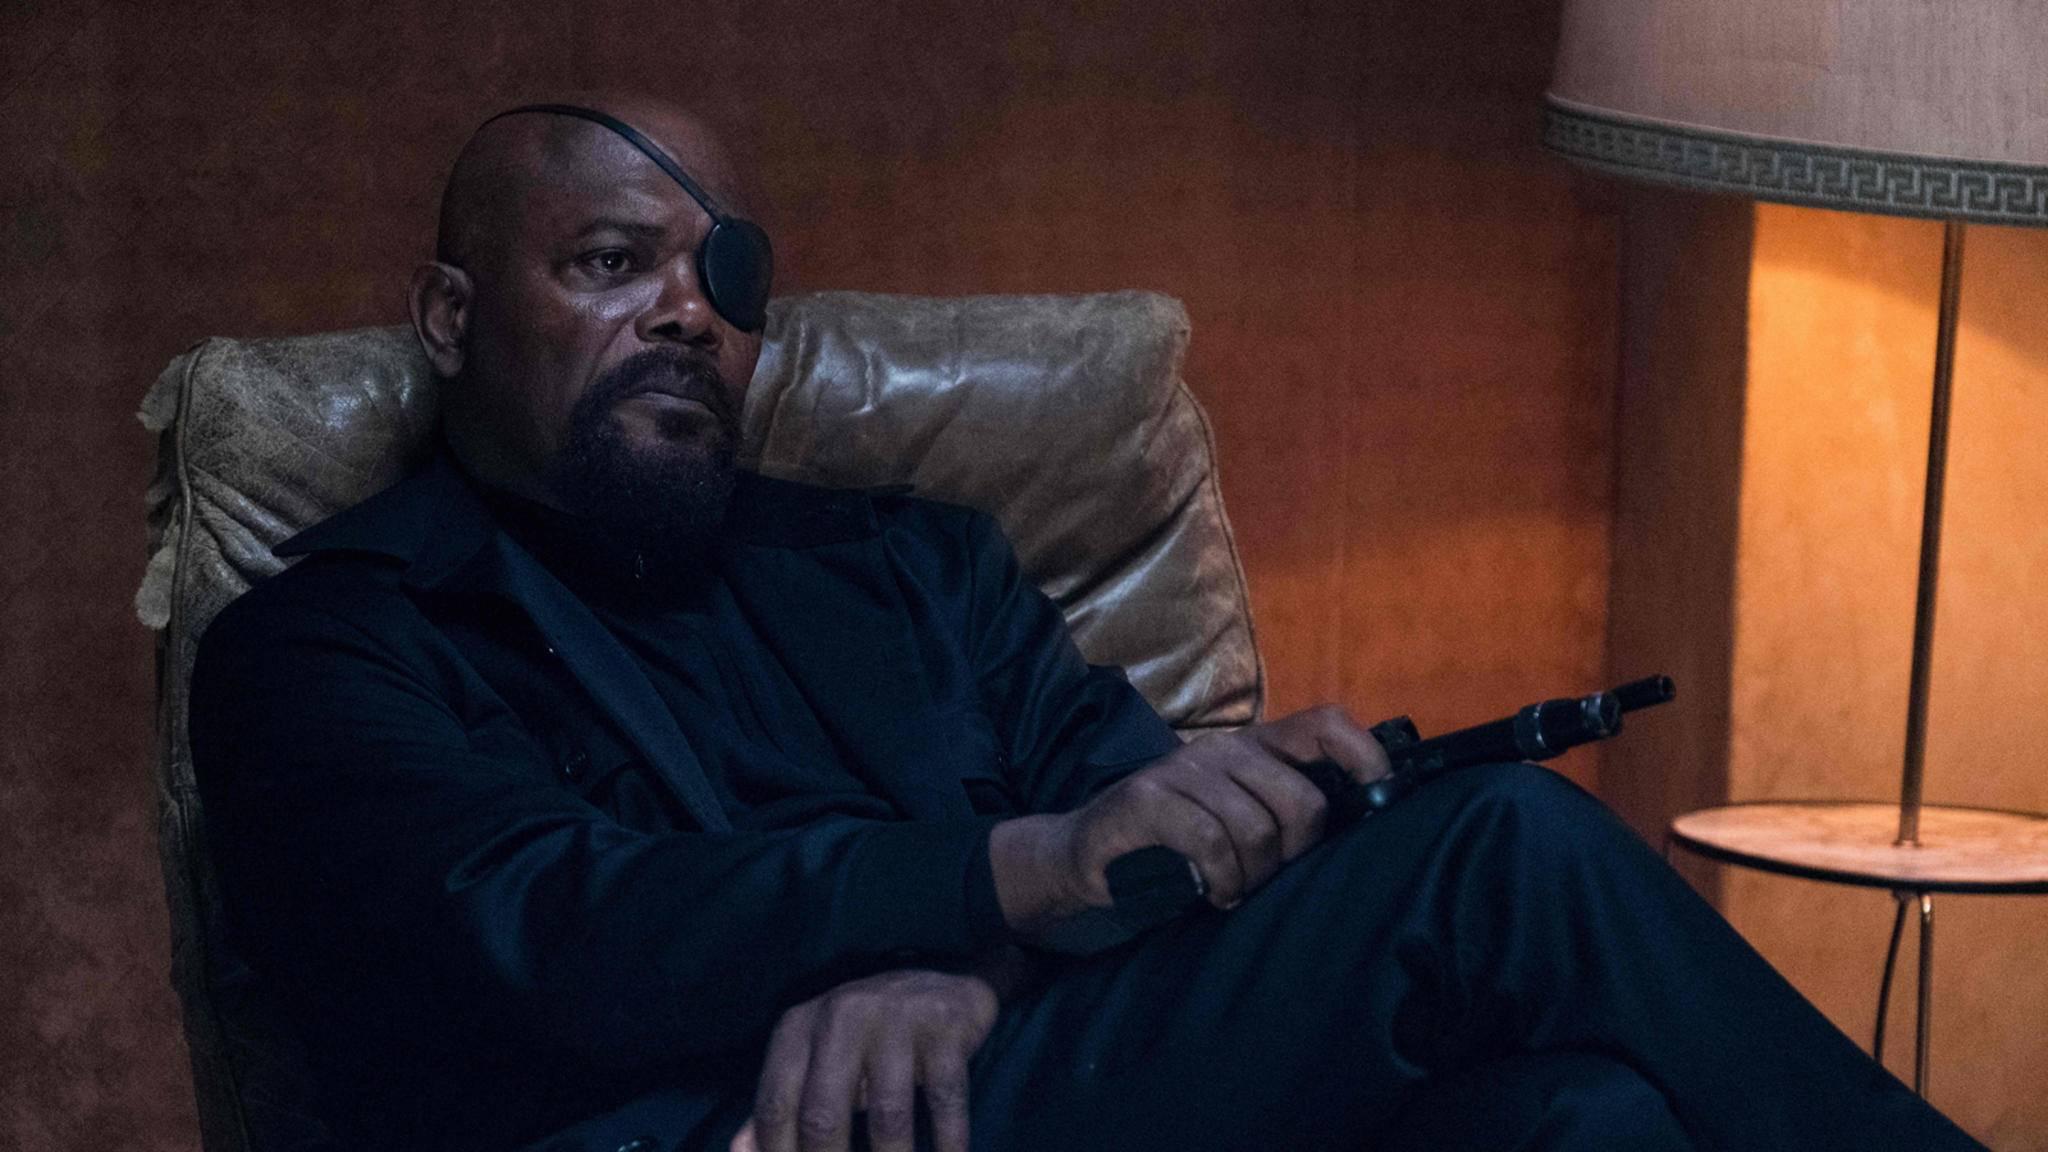 Samuel L Jackson Nick Fury Spider-Man: Far From Home